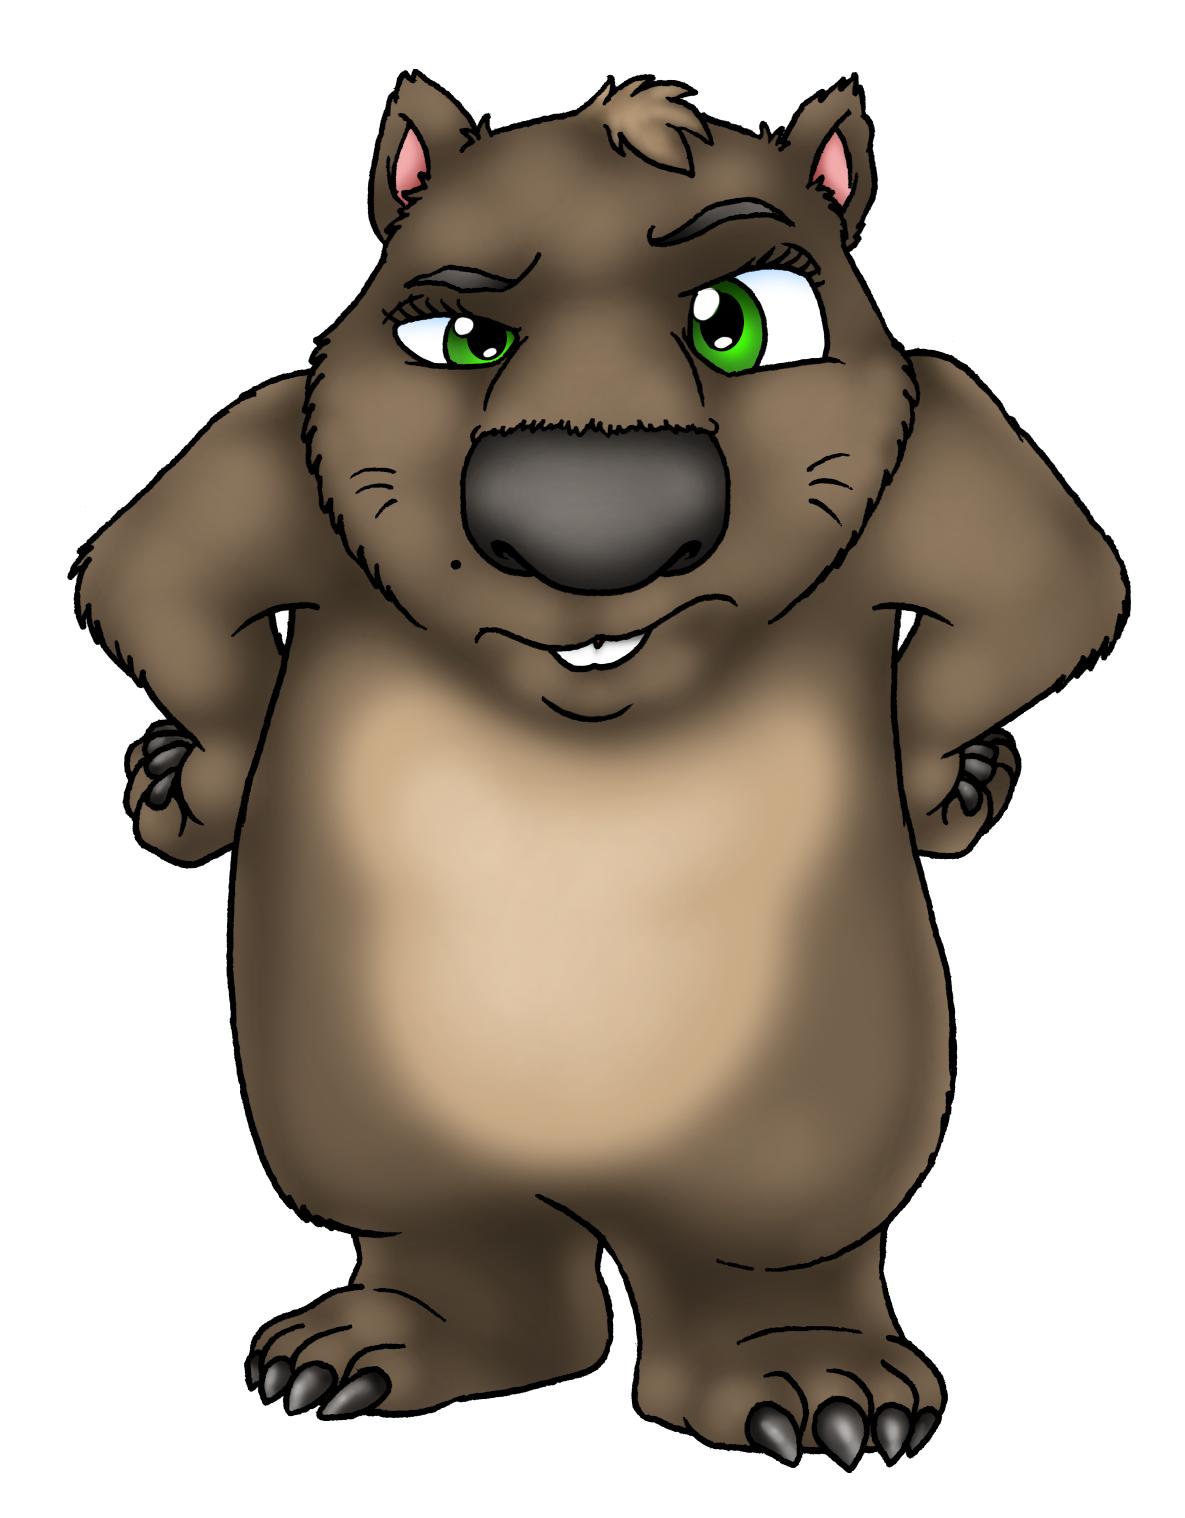 Wombat clipart cute Cartoon wombat Wombat photo#1 Cartoon